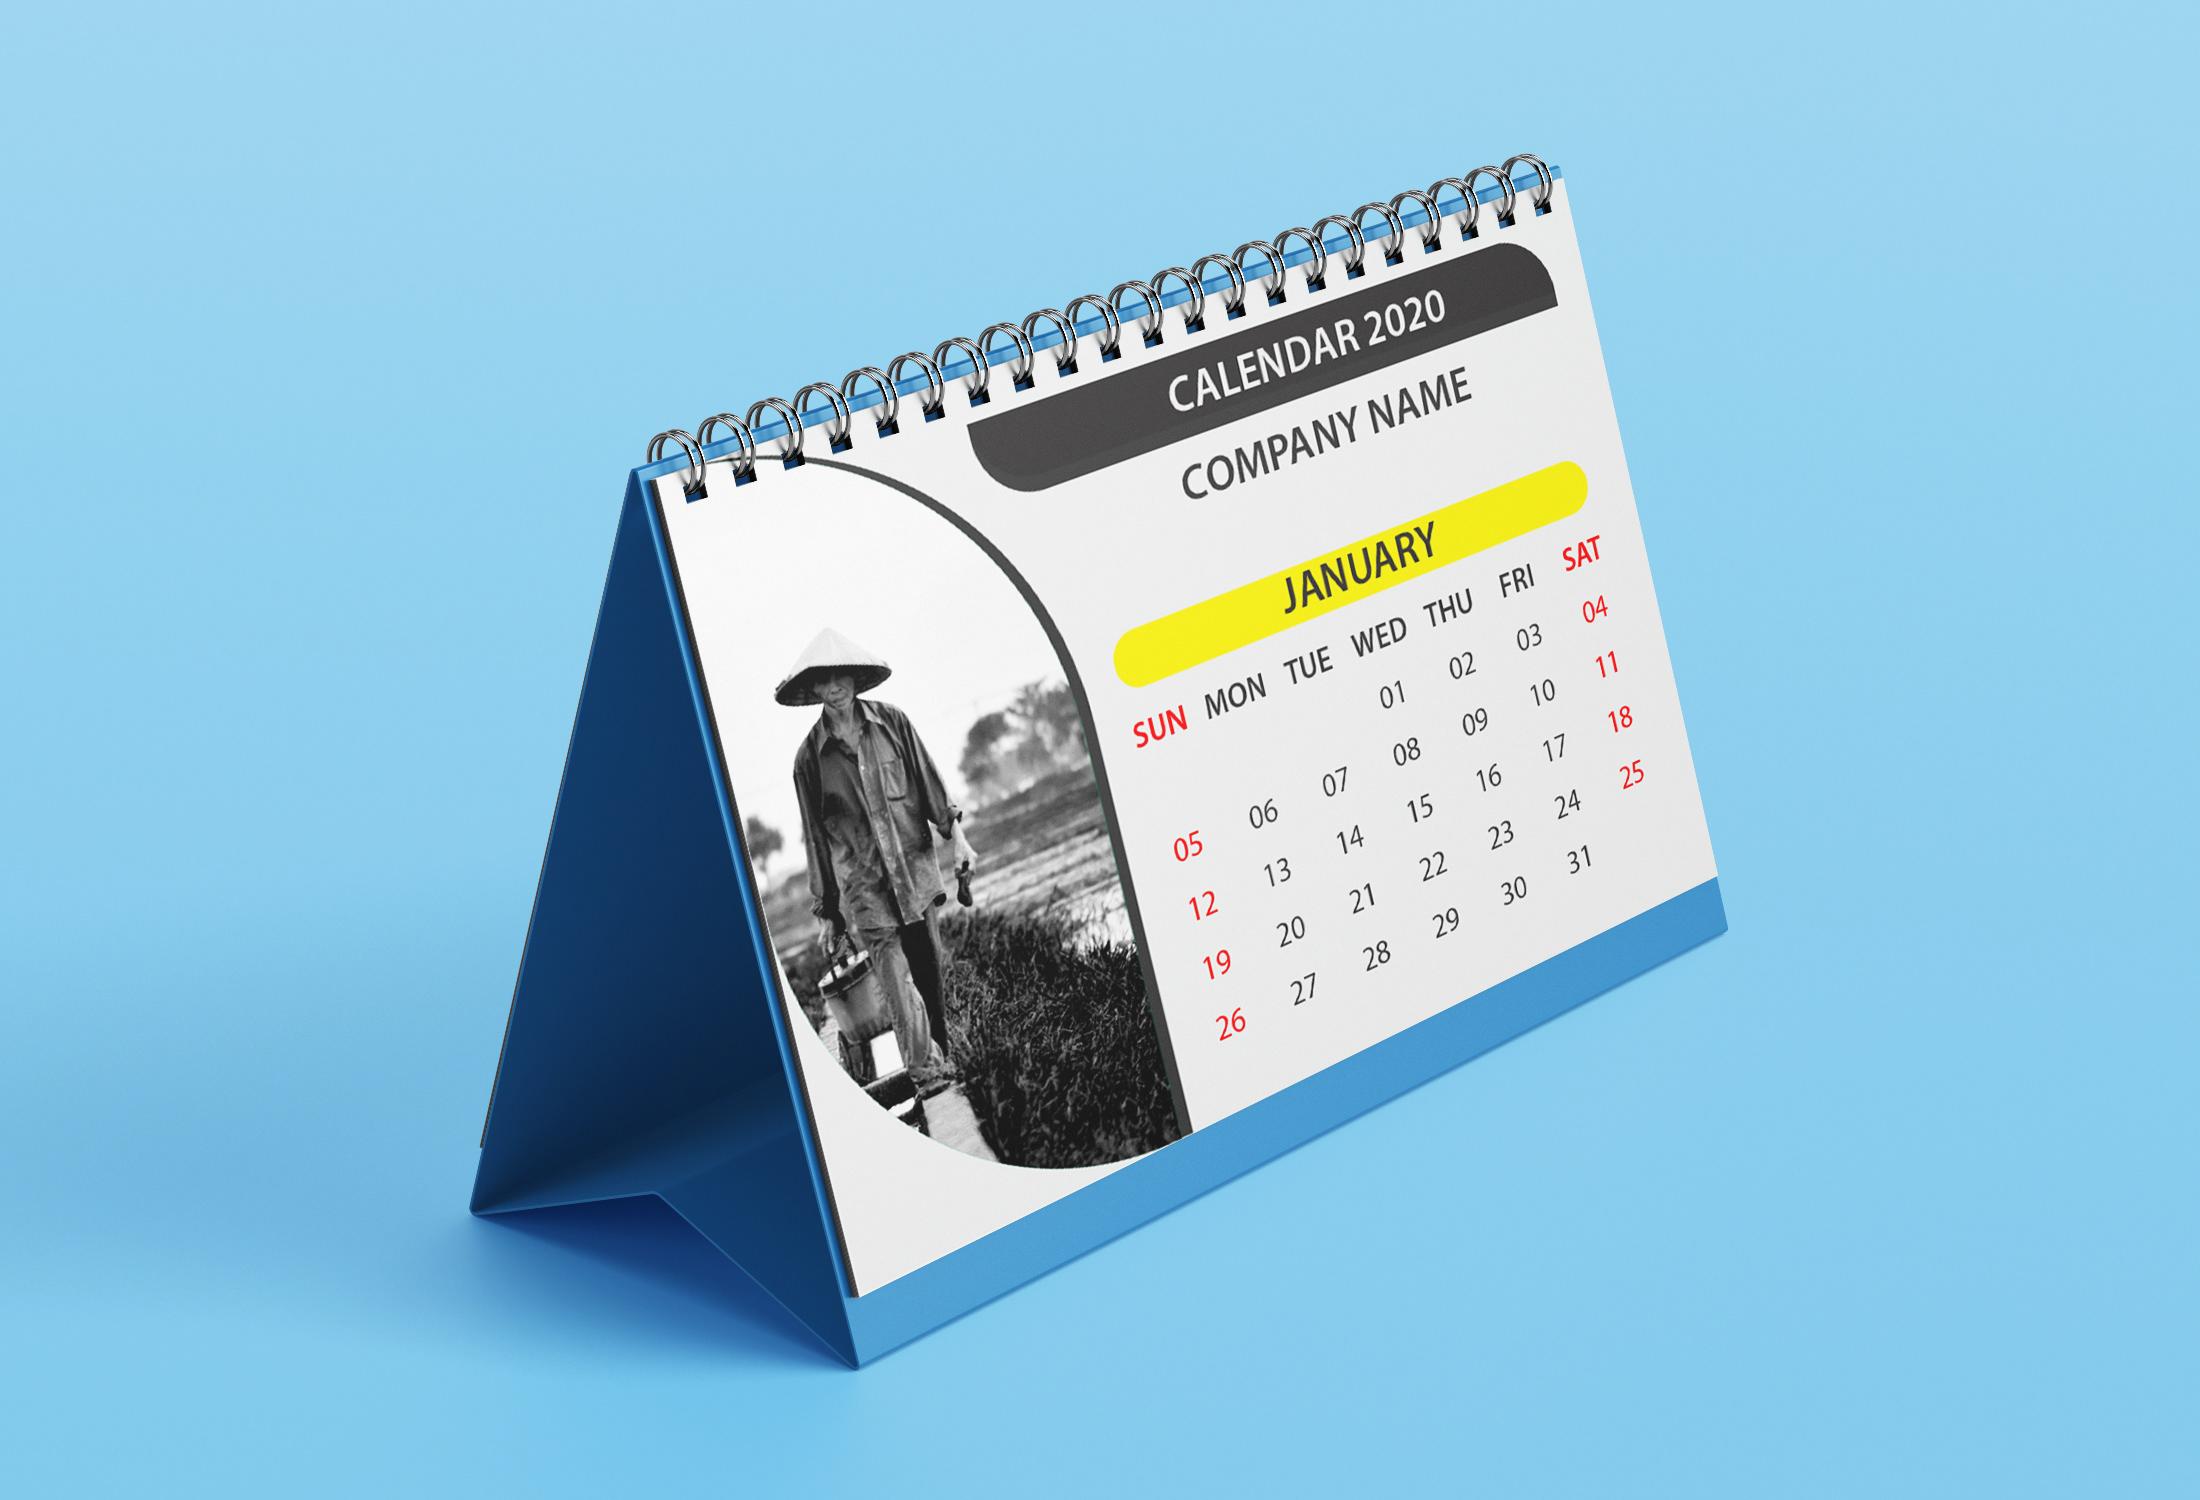 Handmade Calendar Projects | Photos, Videos, Logos Inside University Of Rhosde Island Calendar 20 21